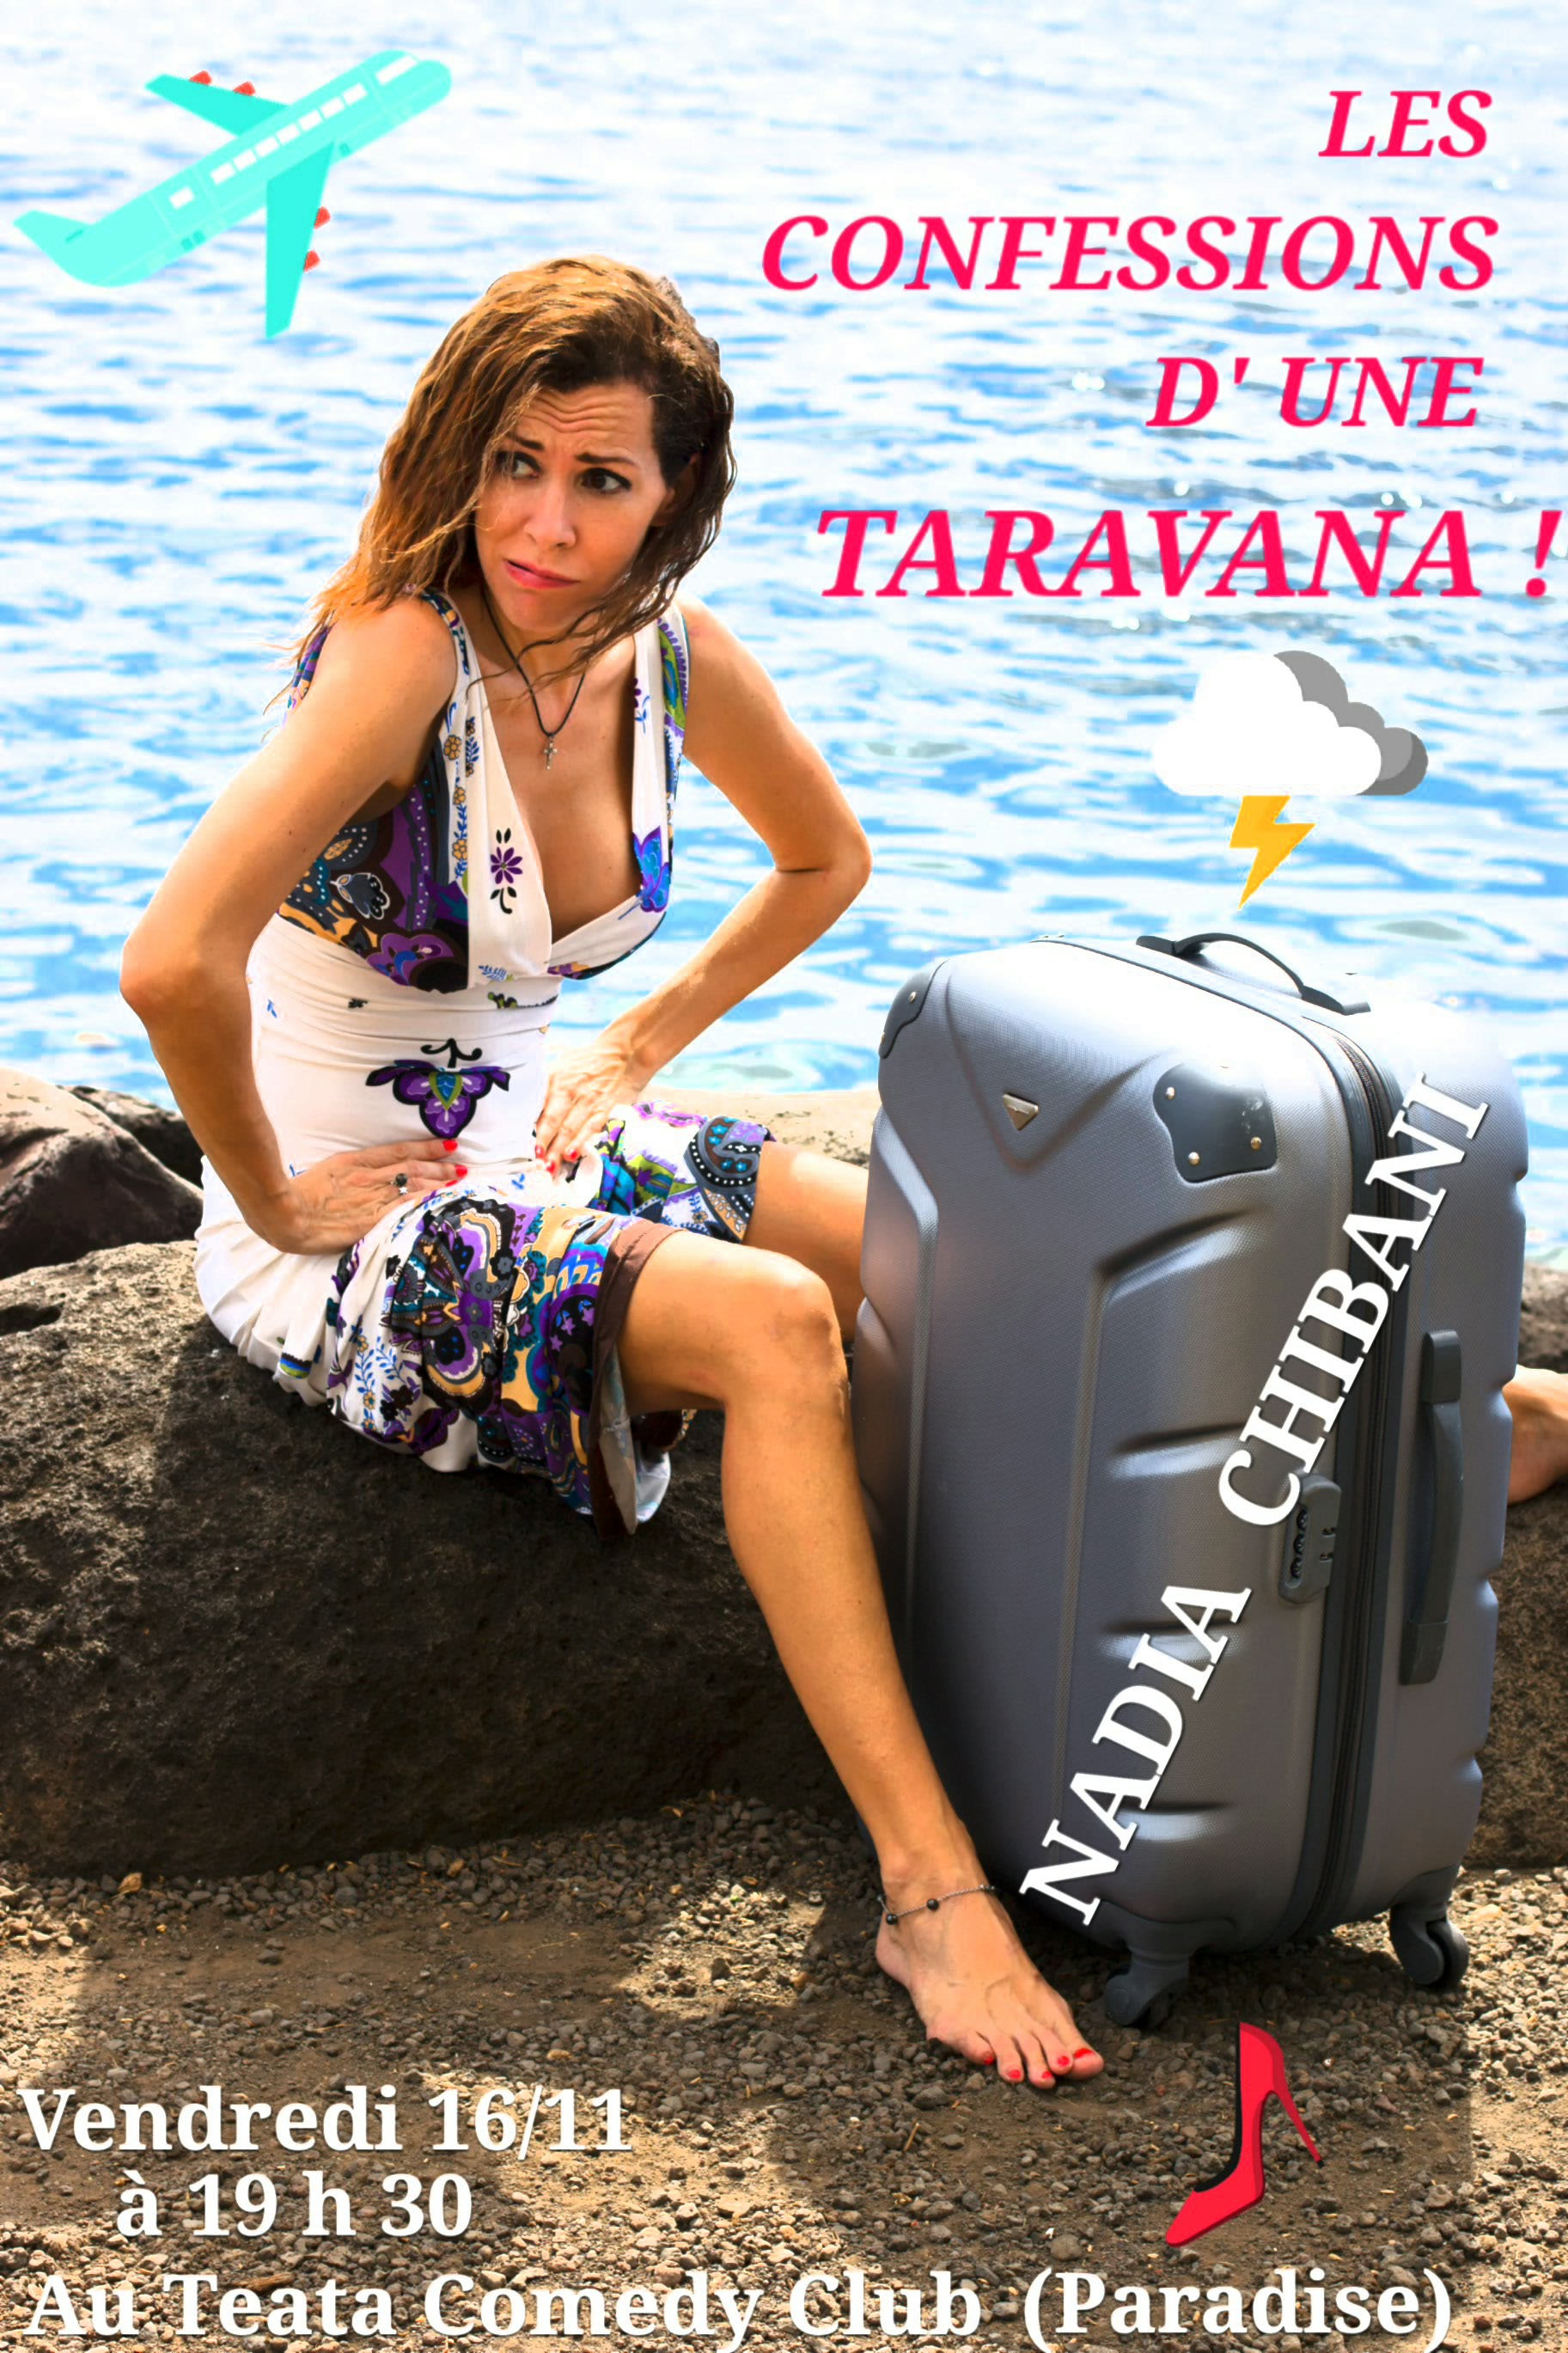 Les confessions d'une taravana, le one-woman-show made in fenua de Nadia Chibani